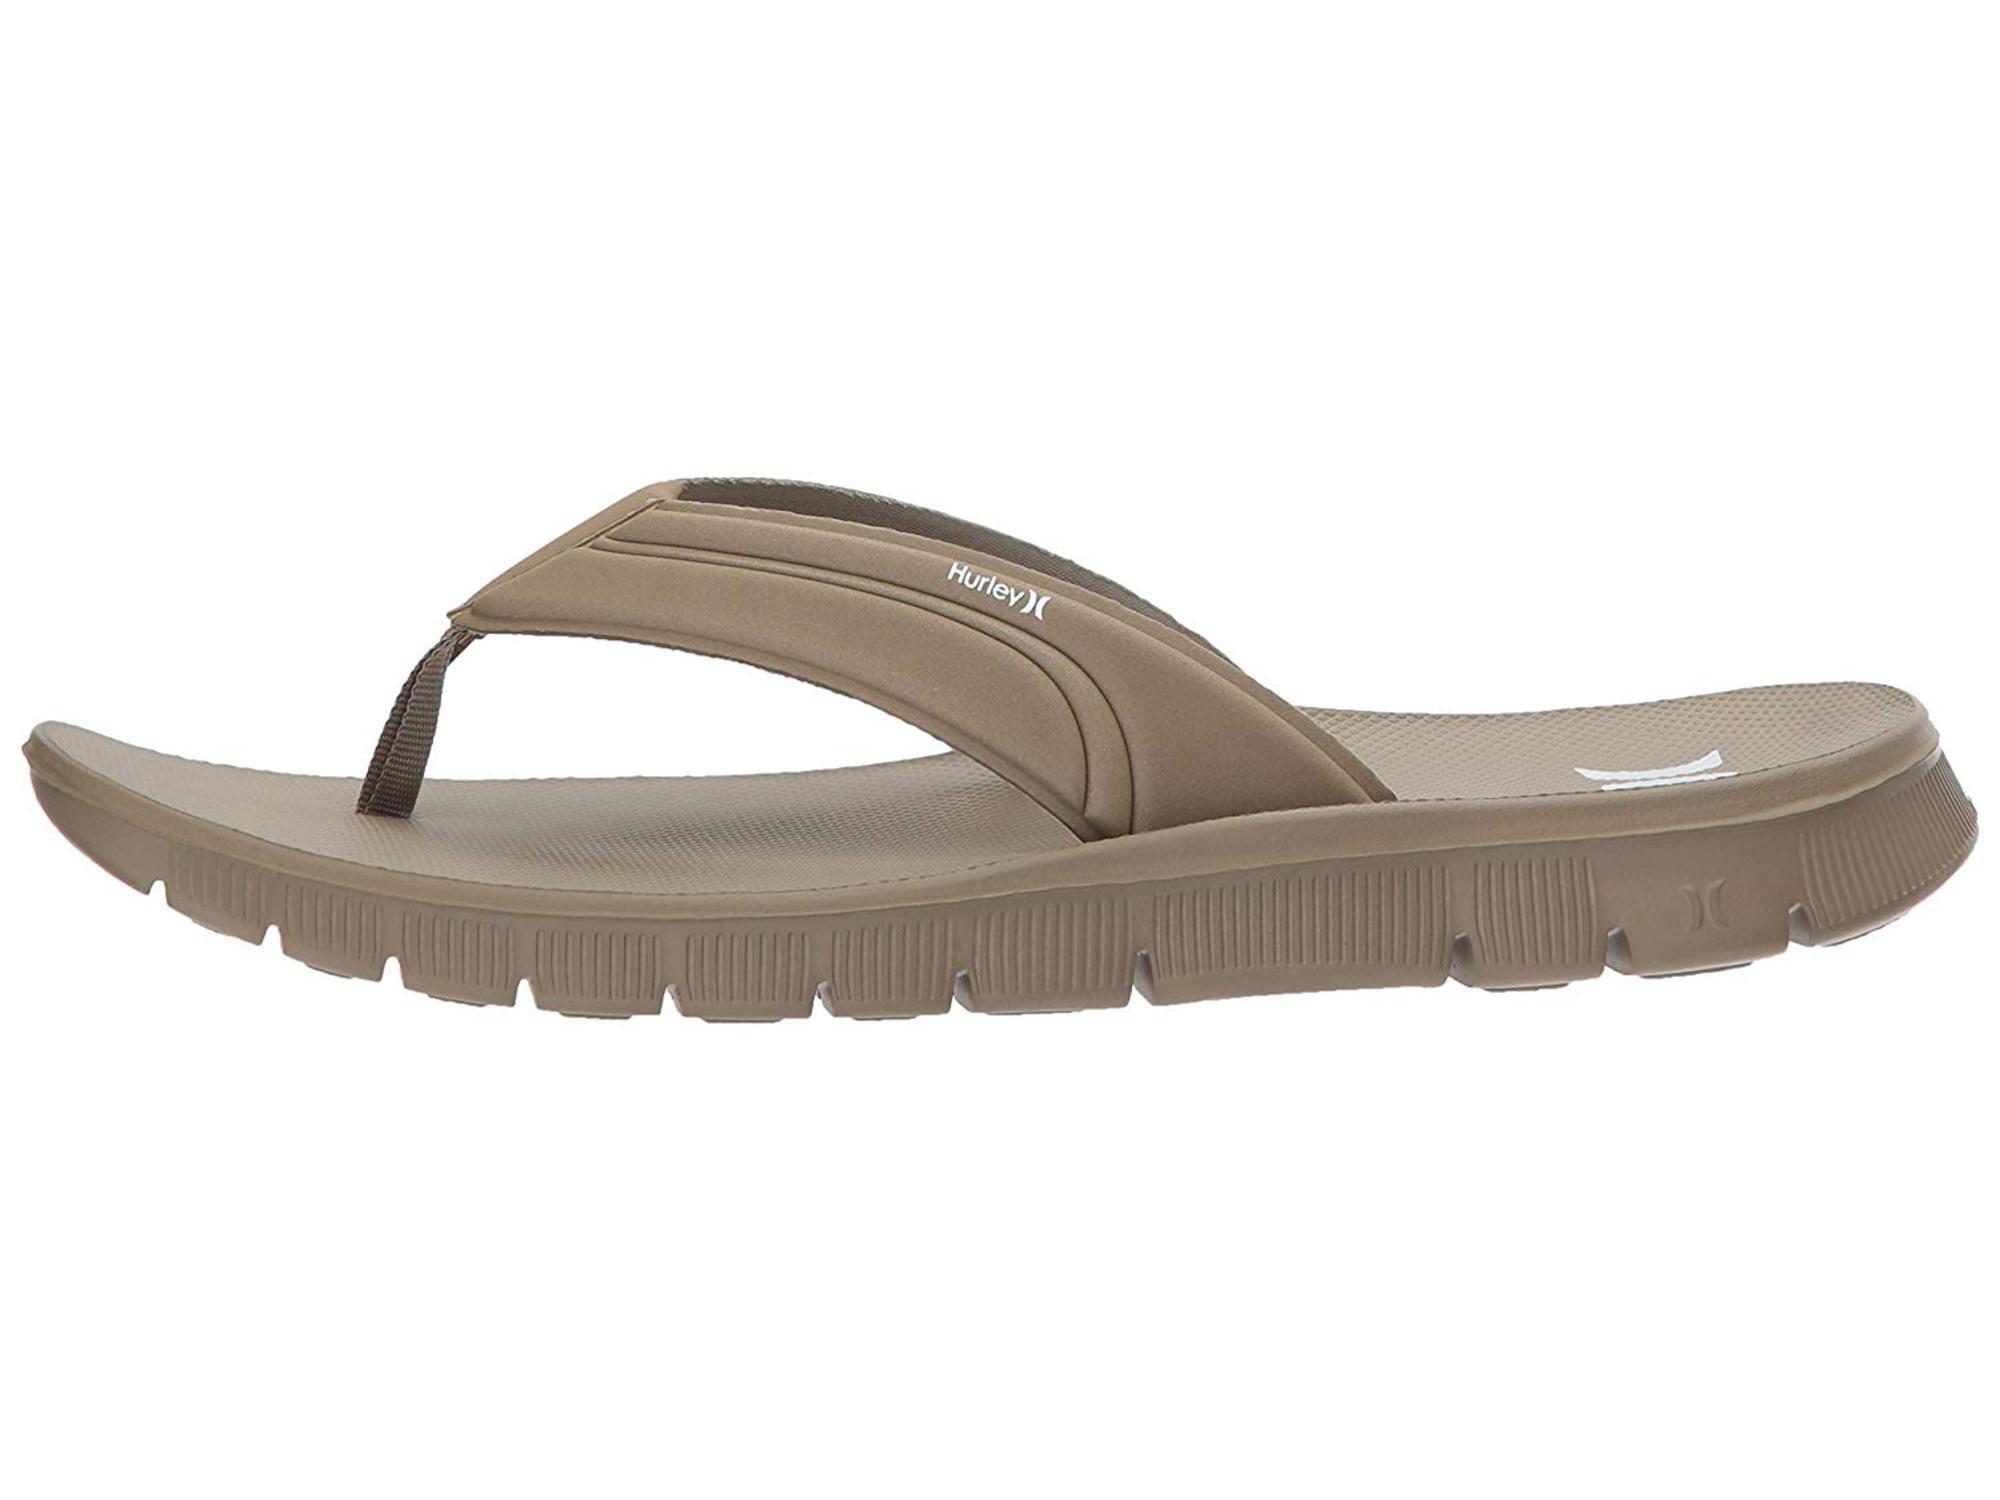 2364a82ae2e Hurley Mens fusion Slip On Open Toe Flip Flops